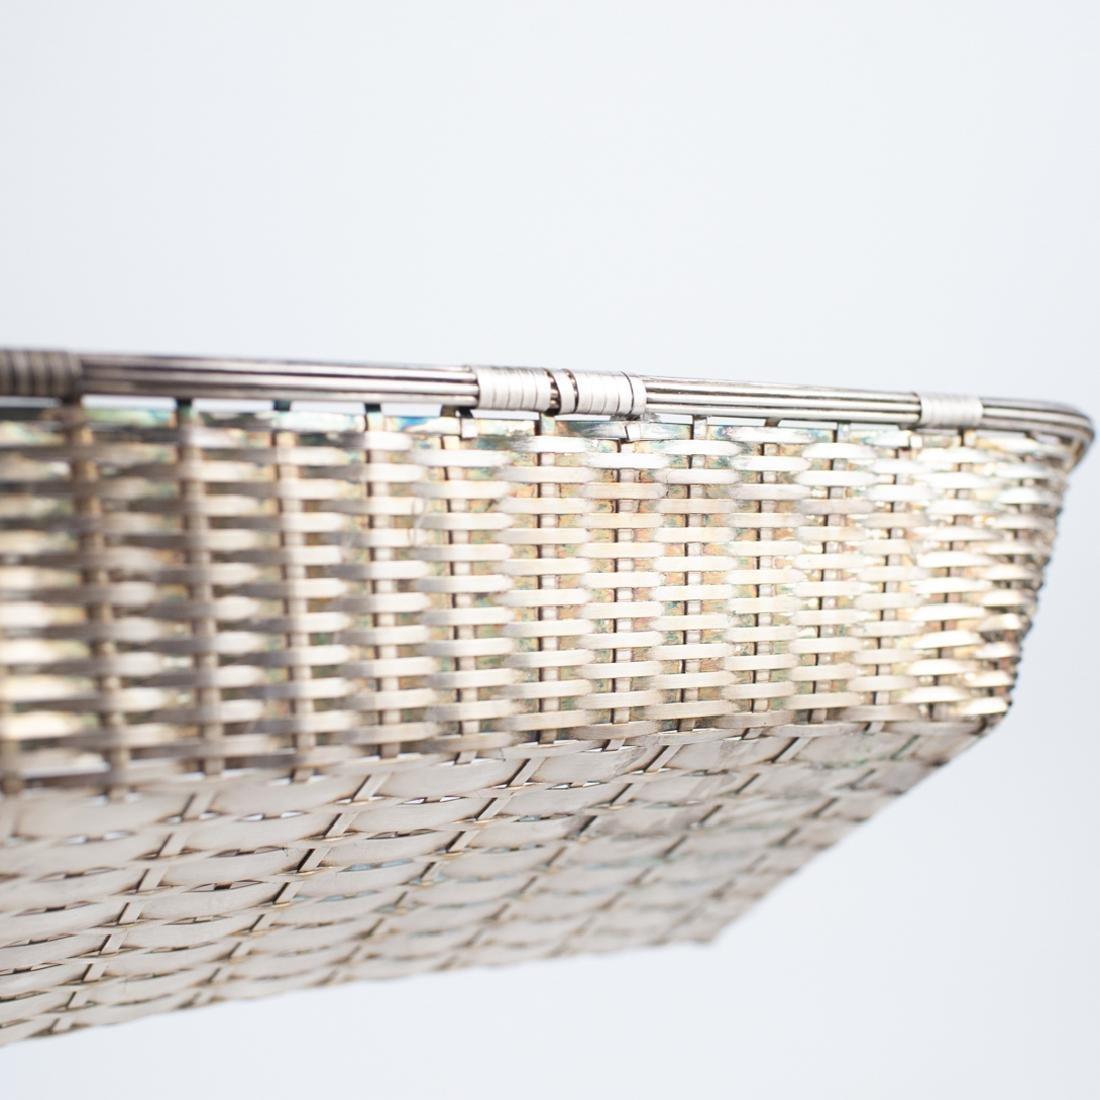 Christofle Silver-Plated Basket - 4